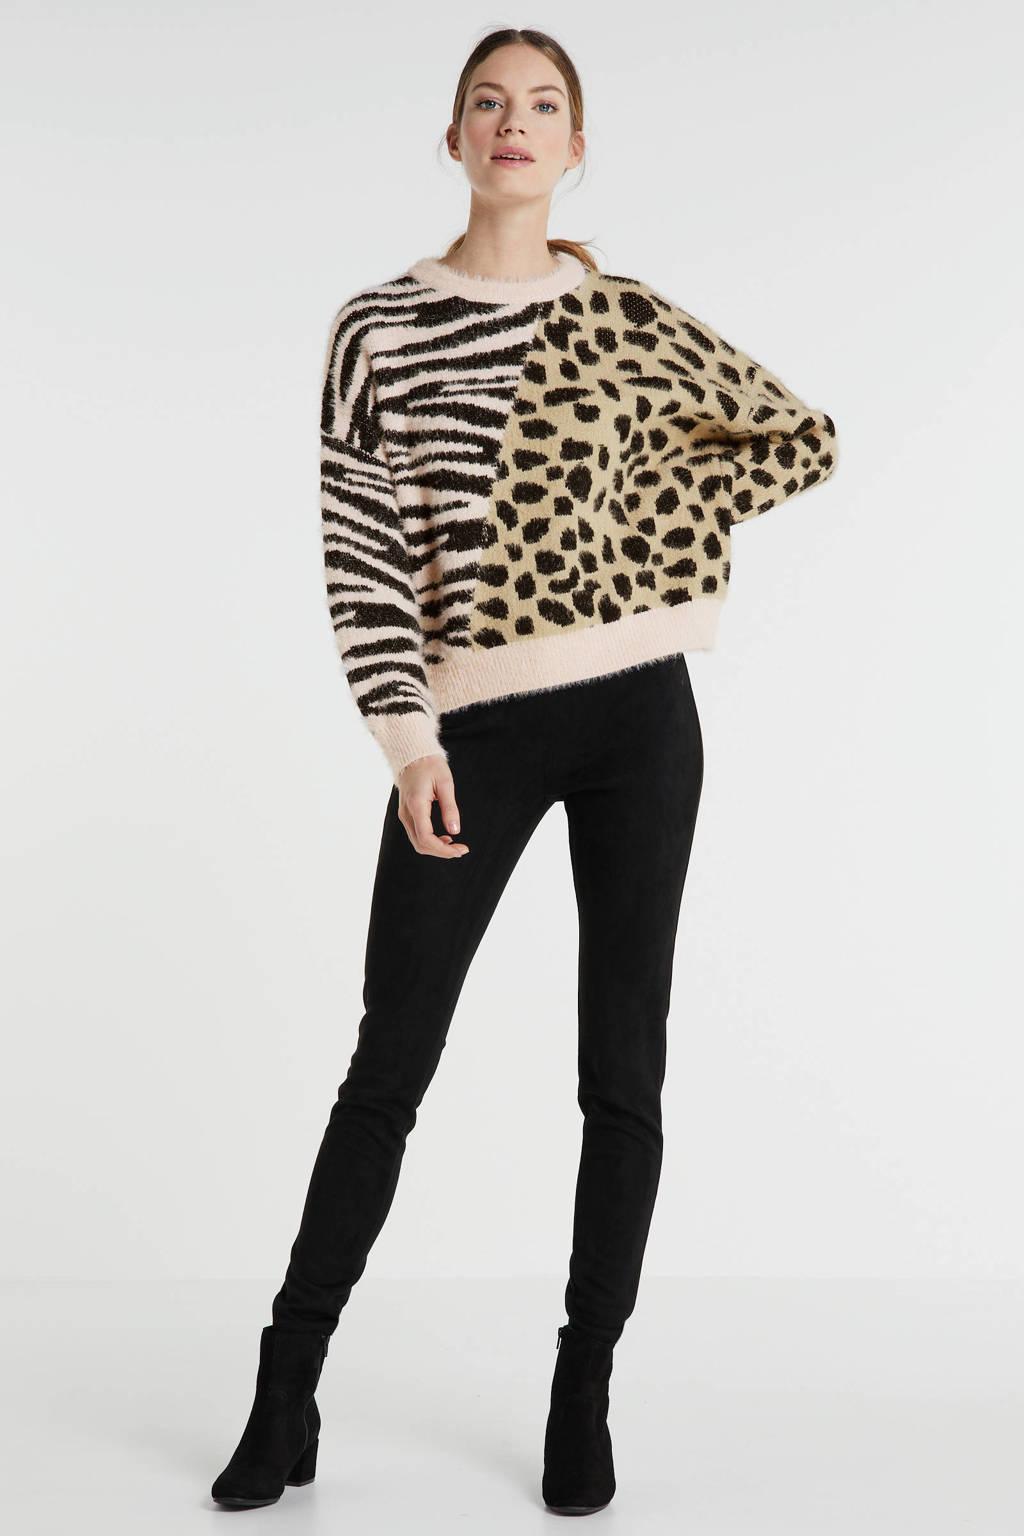 Wild Flower trui met dieren jaquard roze/zwart/camel, Roze/camel/zwart